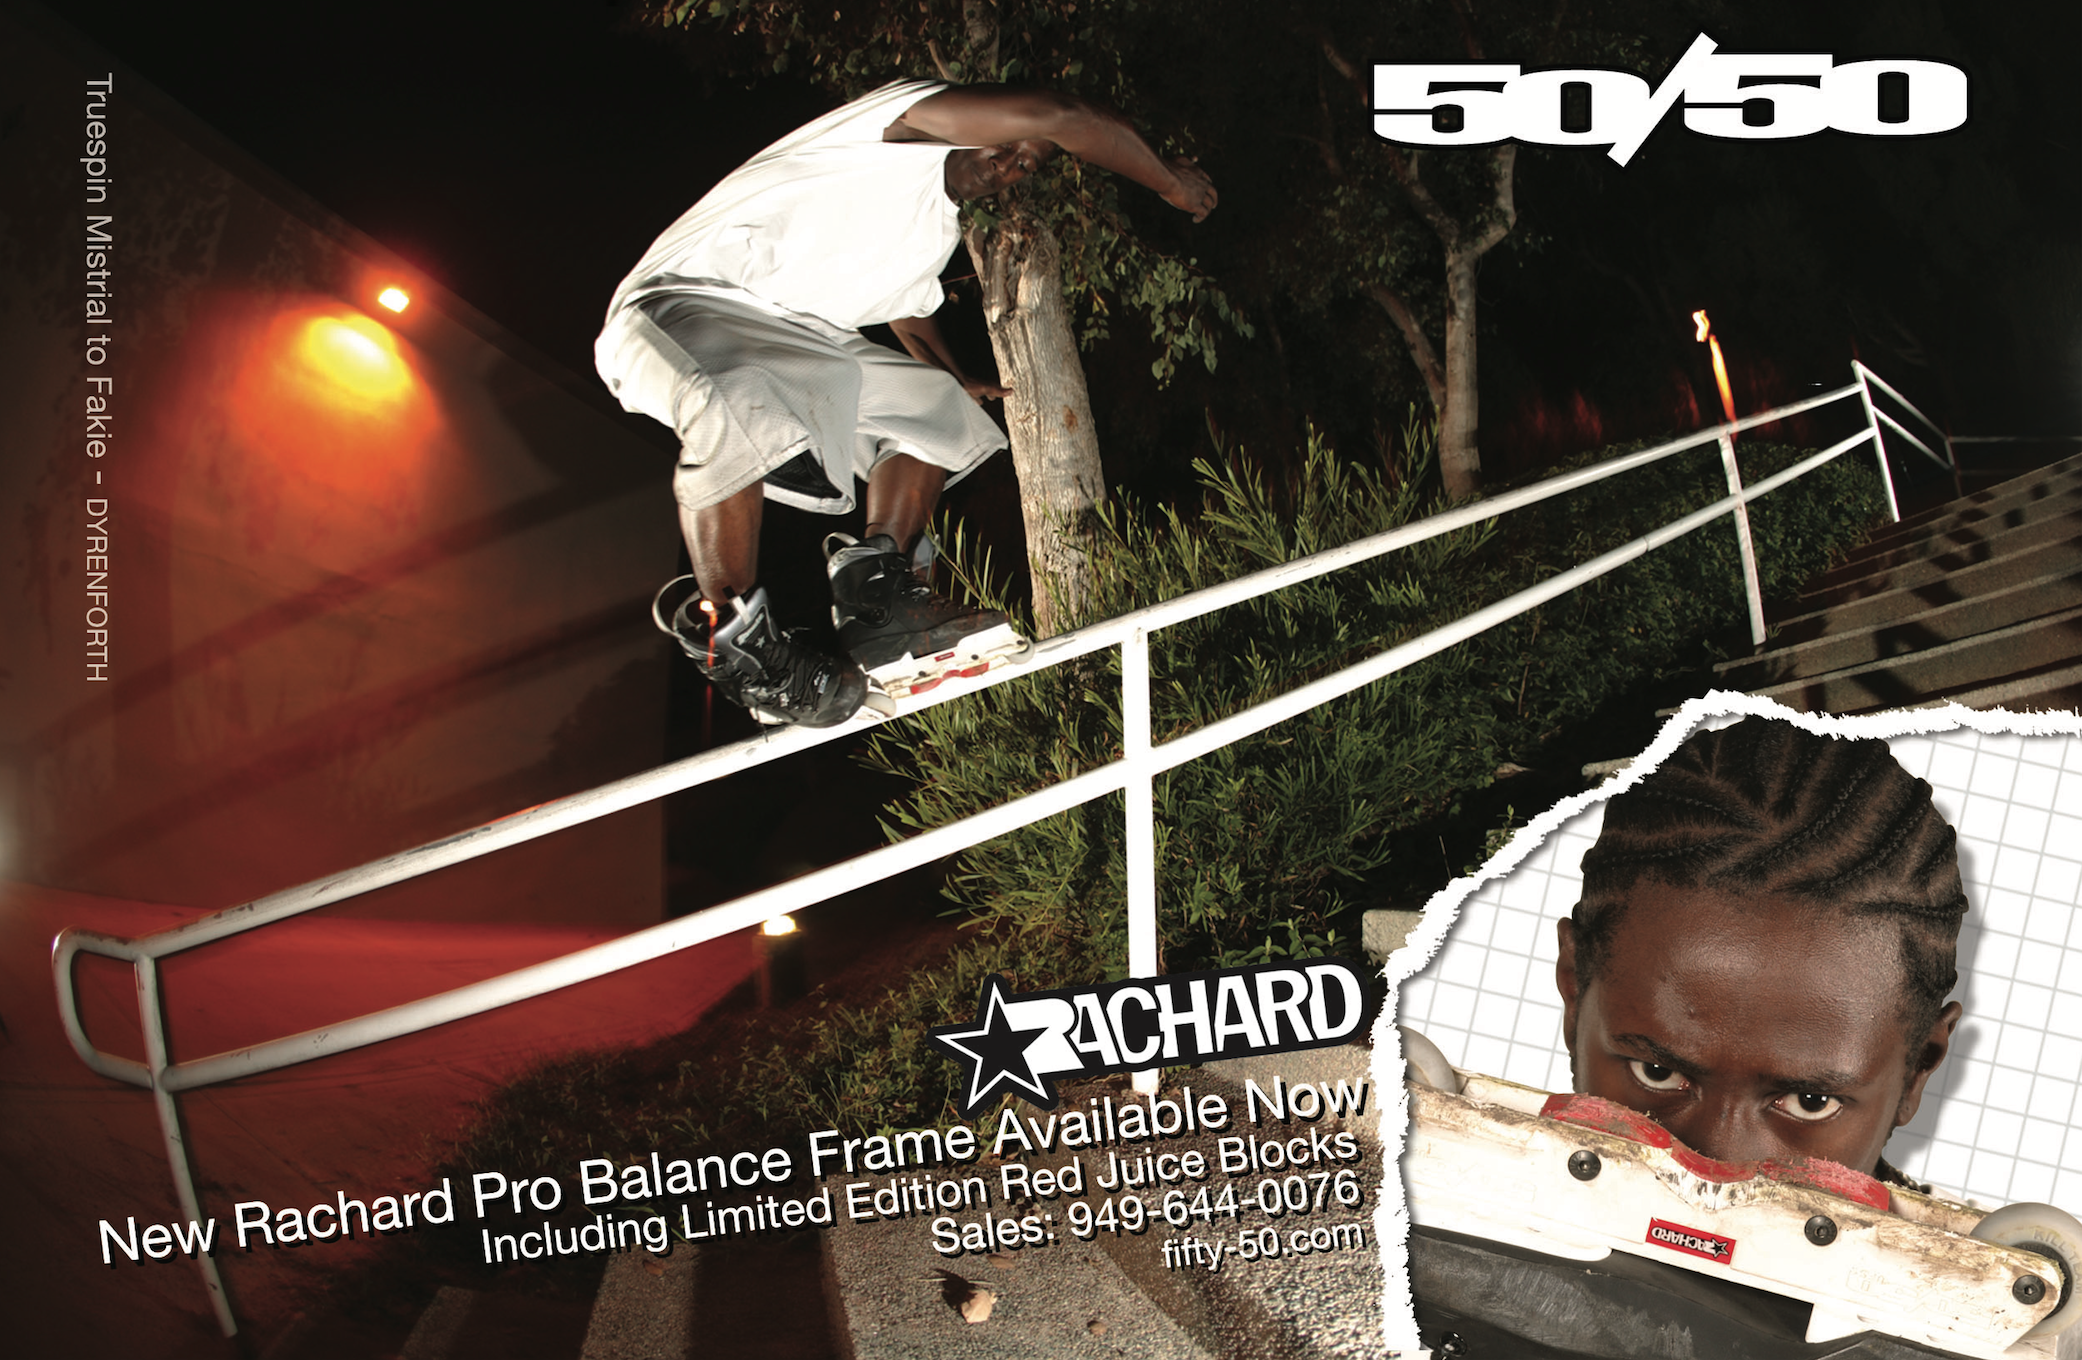 Classic 50/50 Balance ad featuring former pro team rider Rachard Johnson.